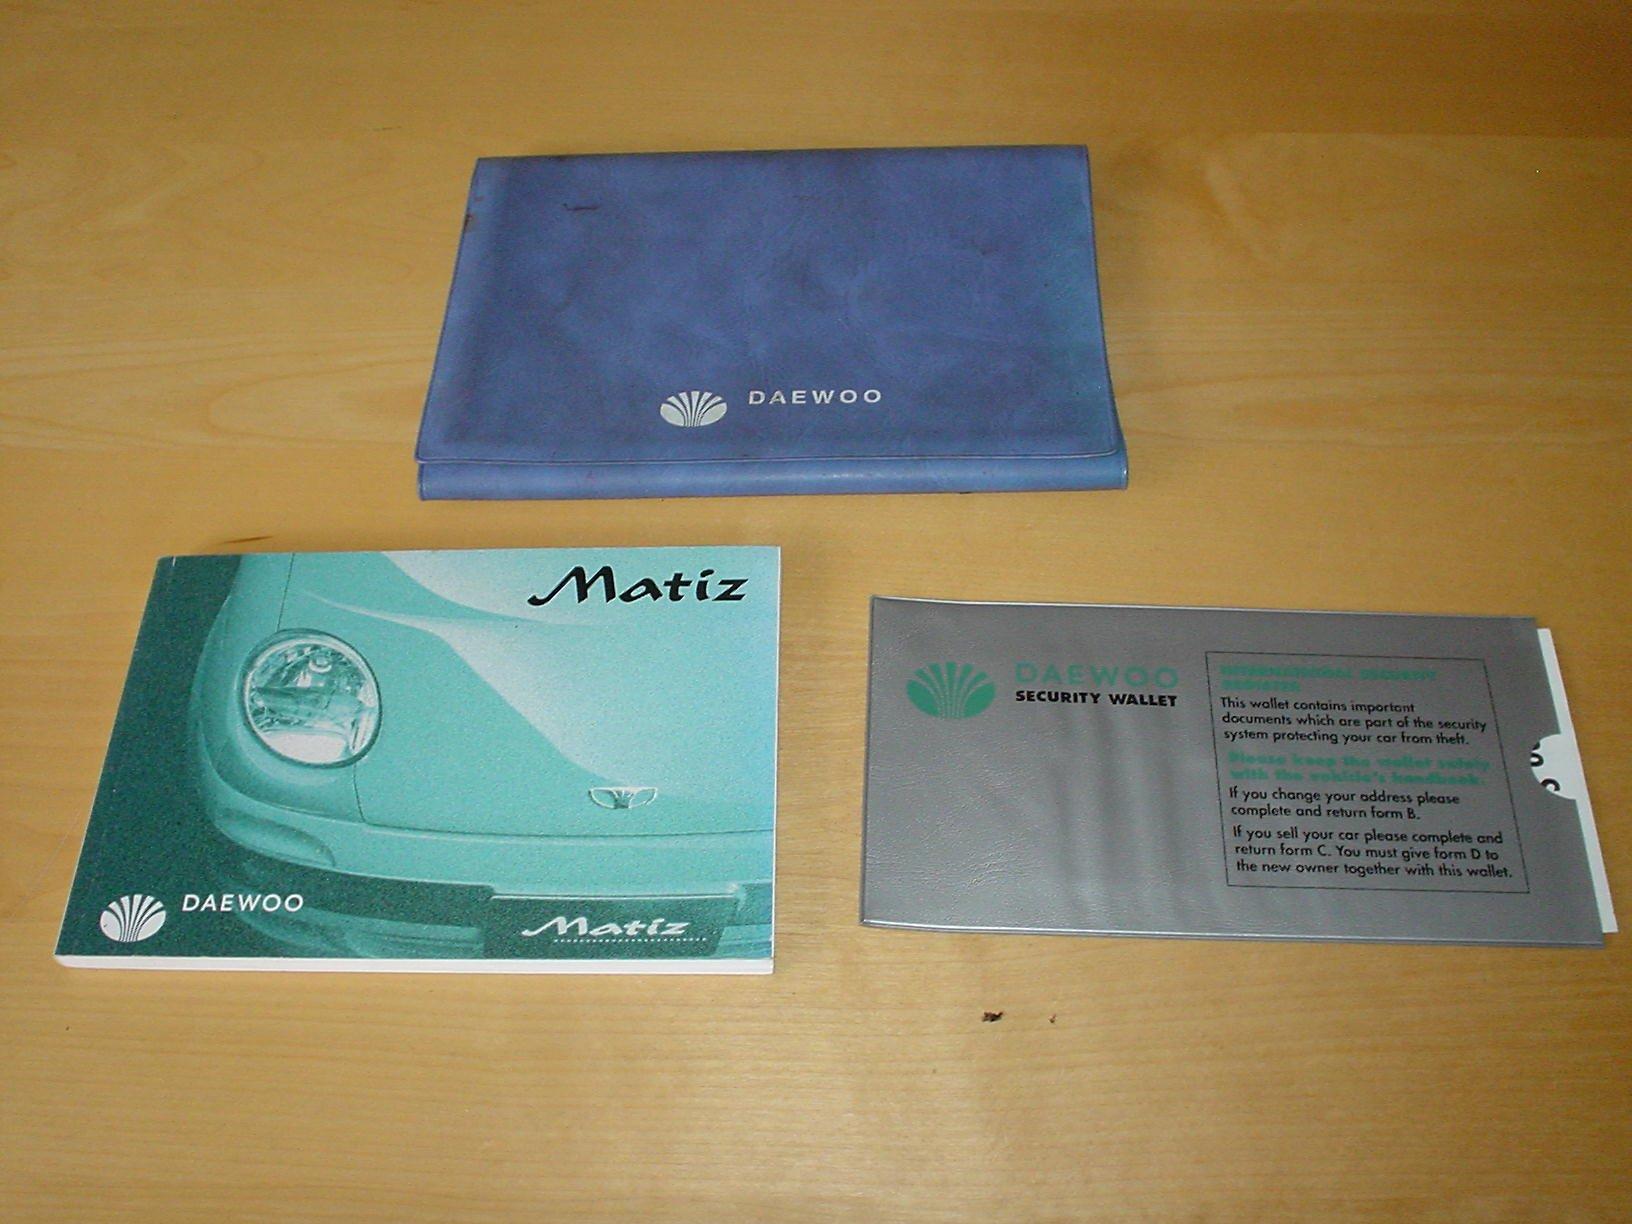 DAEWOO MATIZ OWNERS HANDBOOK + WALLET - 0.8 LITRE ENGINE - (OWNER'S REPAIR  HAND BOOK HANDBOOK MANUAL): Amazon.co.uk: DAEWOO: Books